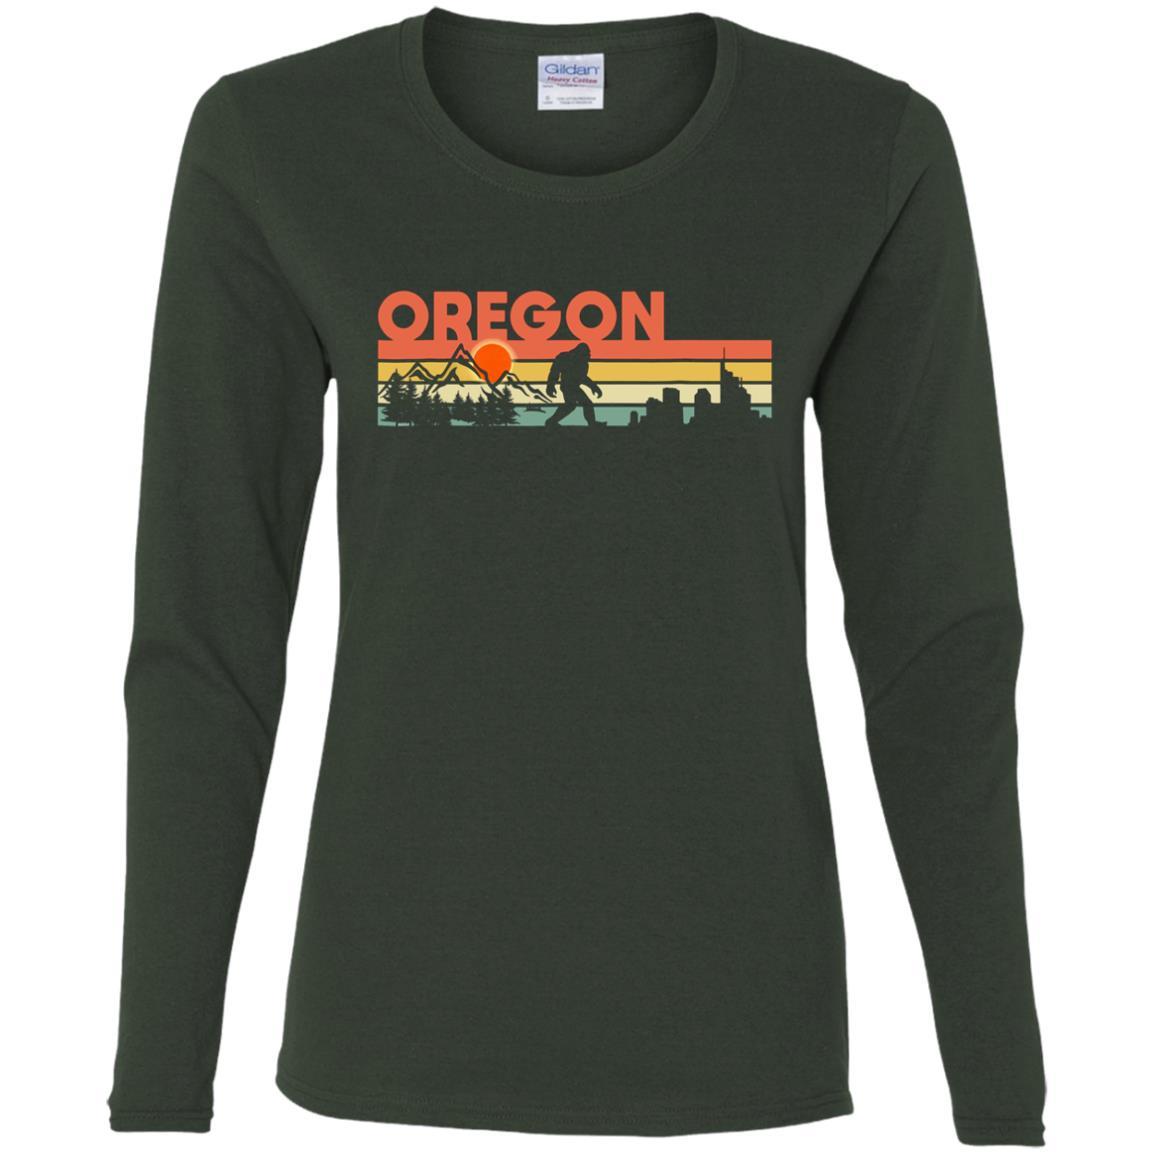 Vintage Oregon Bigfoot Silhouette Sun – Believe! Women Long Sleeve T-Shirt